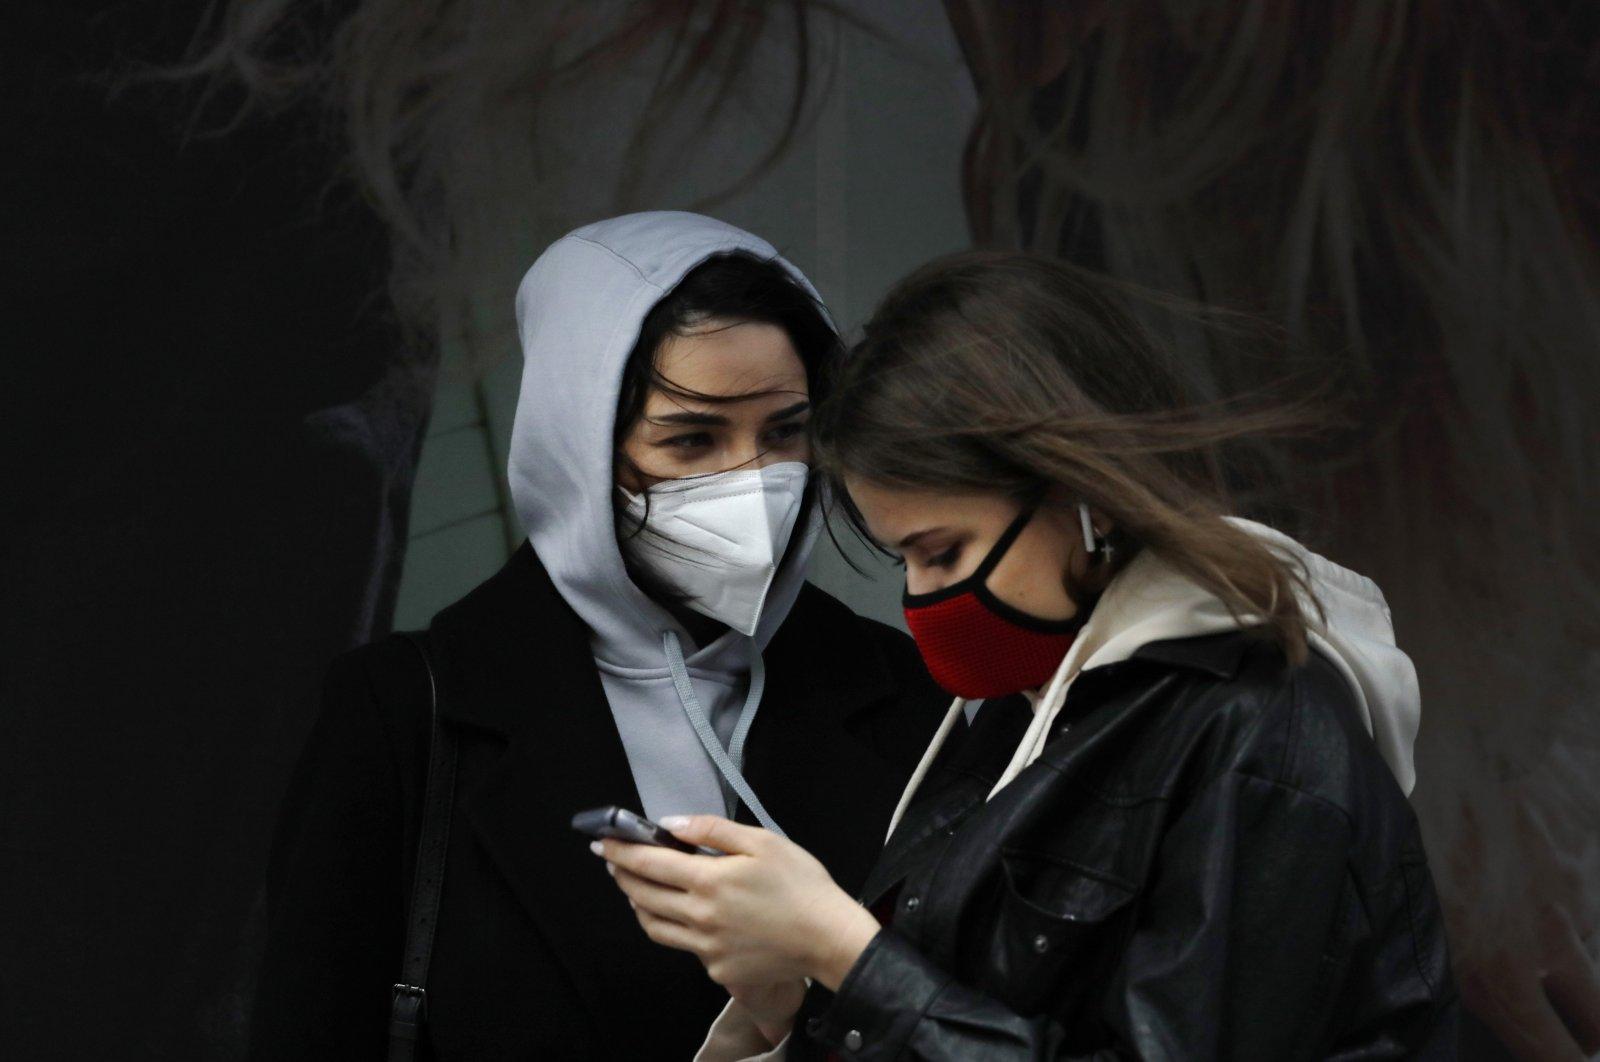 Women wearing masks talk in New York's Times Square, April 9, 2020, amid the coronavirus epidemic. (AP Photo)